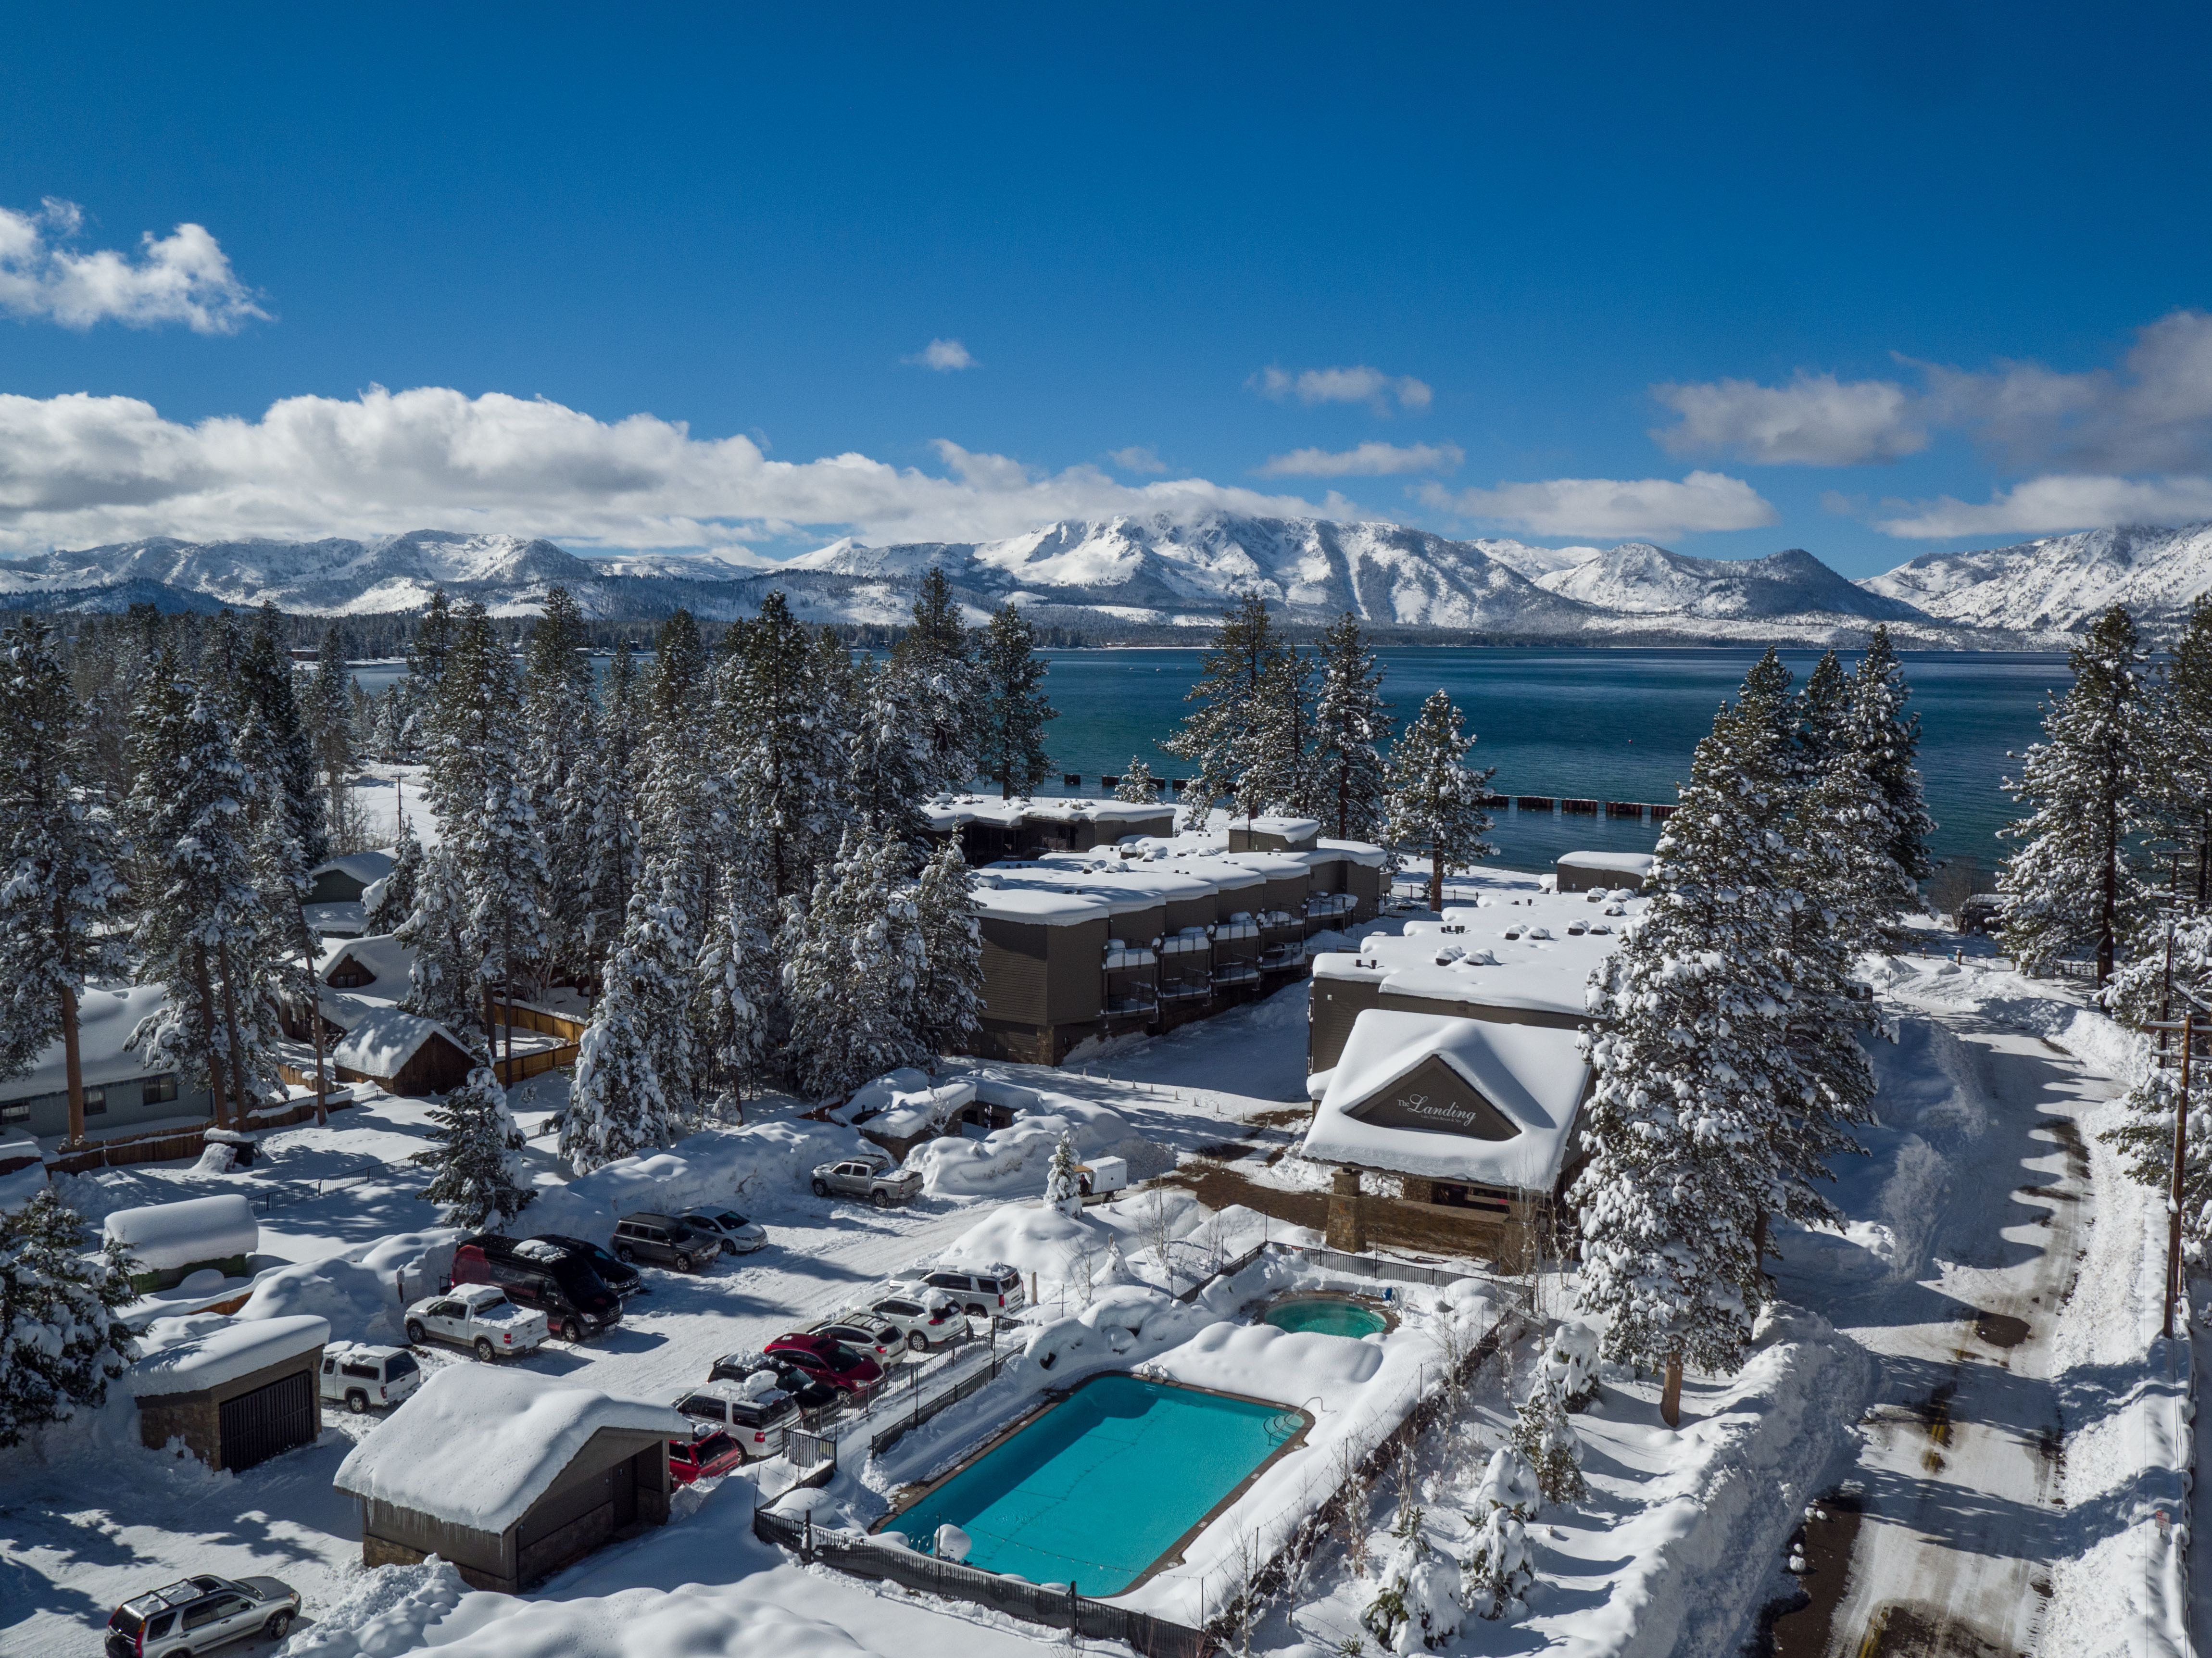 Best Kitchen Gallery: The Landing Resort Spa Promotes Work Life Balance On Lake Tahoe of Hotels Near Heavenly Ski Resort  on rachelxblog.com